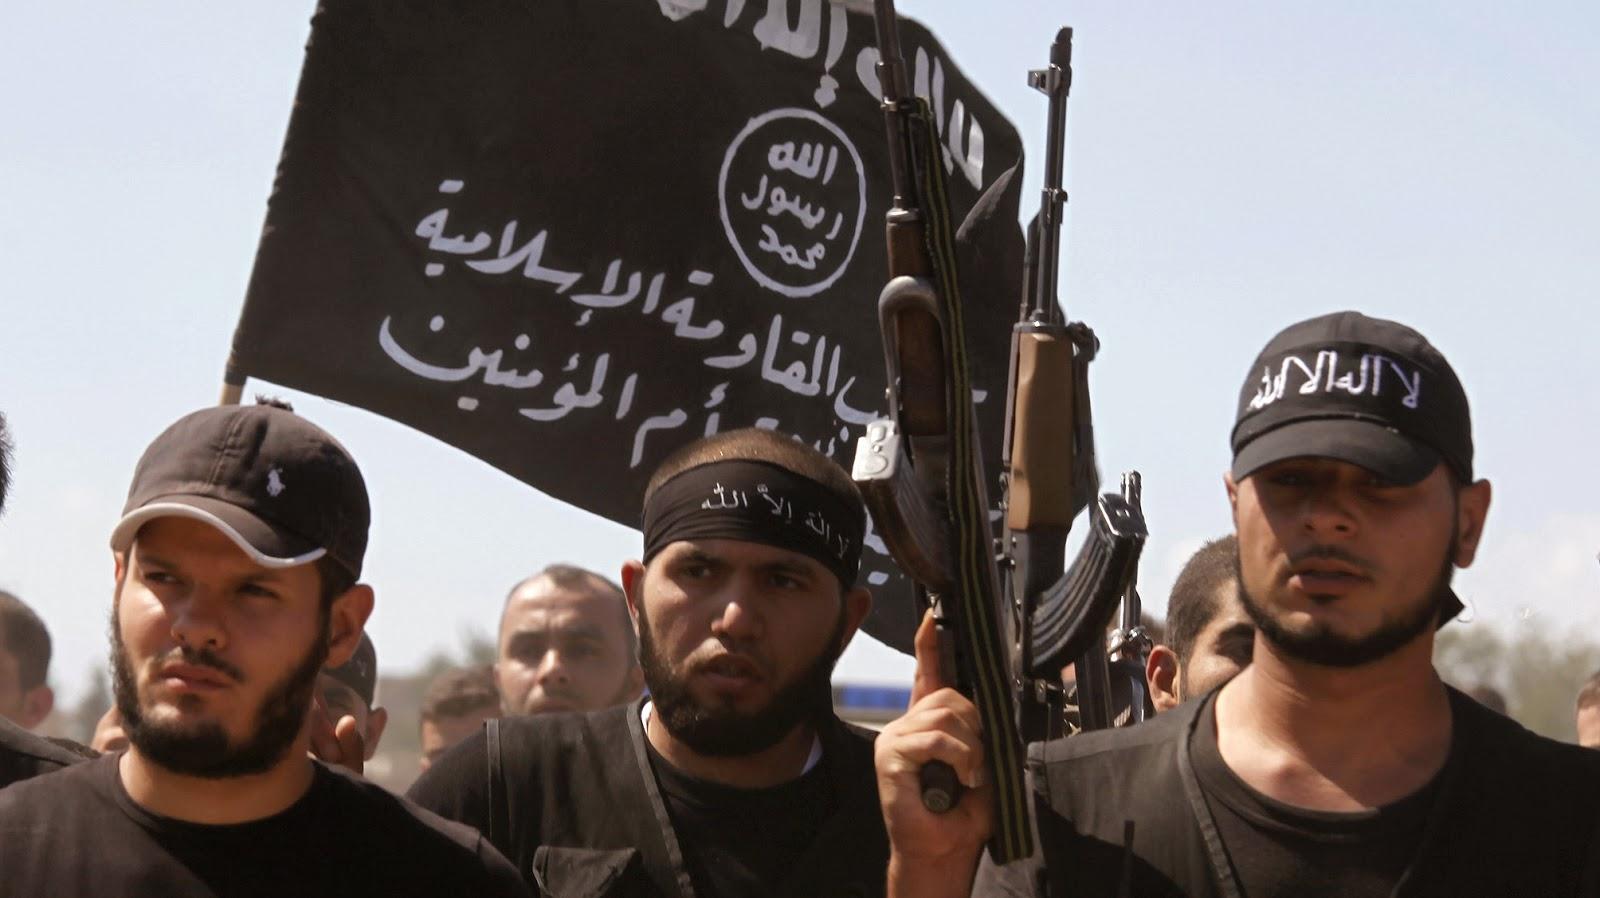 "NATO si CIA sustin premeditat si planificat teroristii AL QAIDA din Siria/ Strigatul unui mitropolit sirian: <b><i>""UNDE ESTE CONSTIINTA CRESTINA?""</i></b> MASACRAREA SI MARTIRIZAREA CRESTINILOR SIRIENI PRIN COMPLICITATEA OCCIDENTULUI SI NEPASAREA NOASTRA"